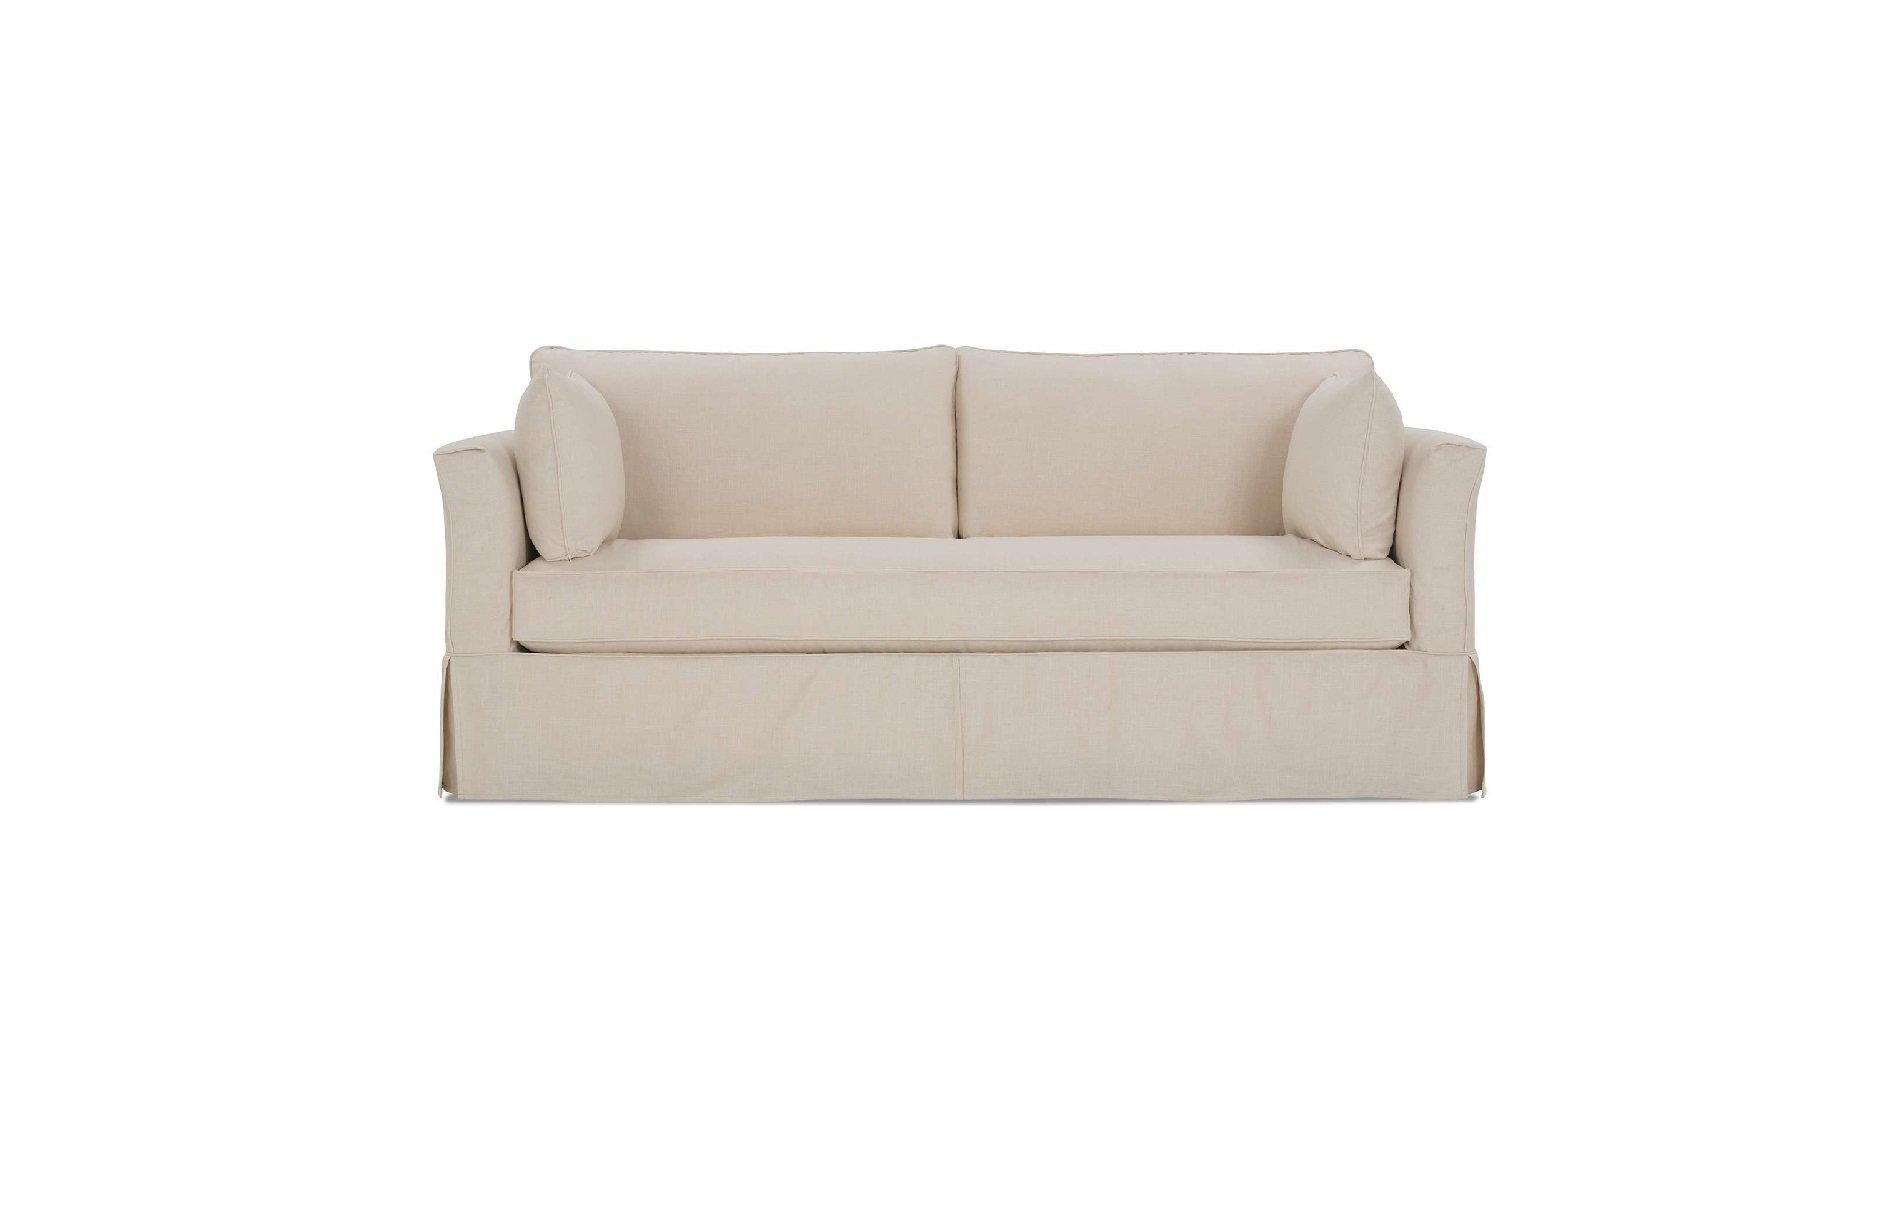 Rowe Darby Bench Slipcover Sofa